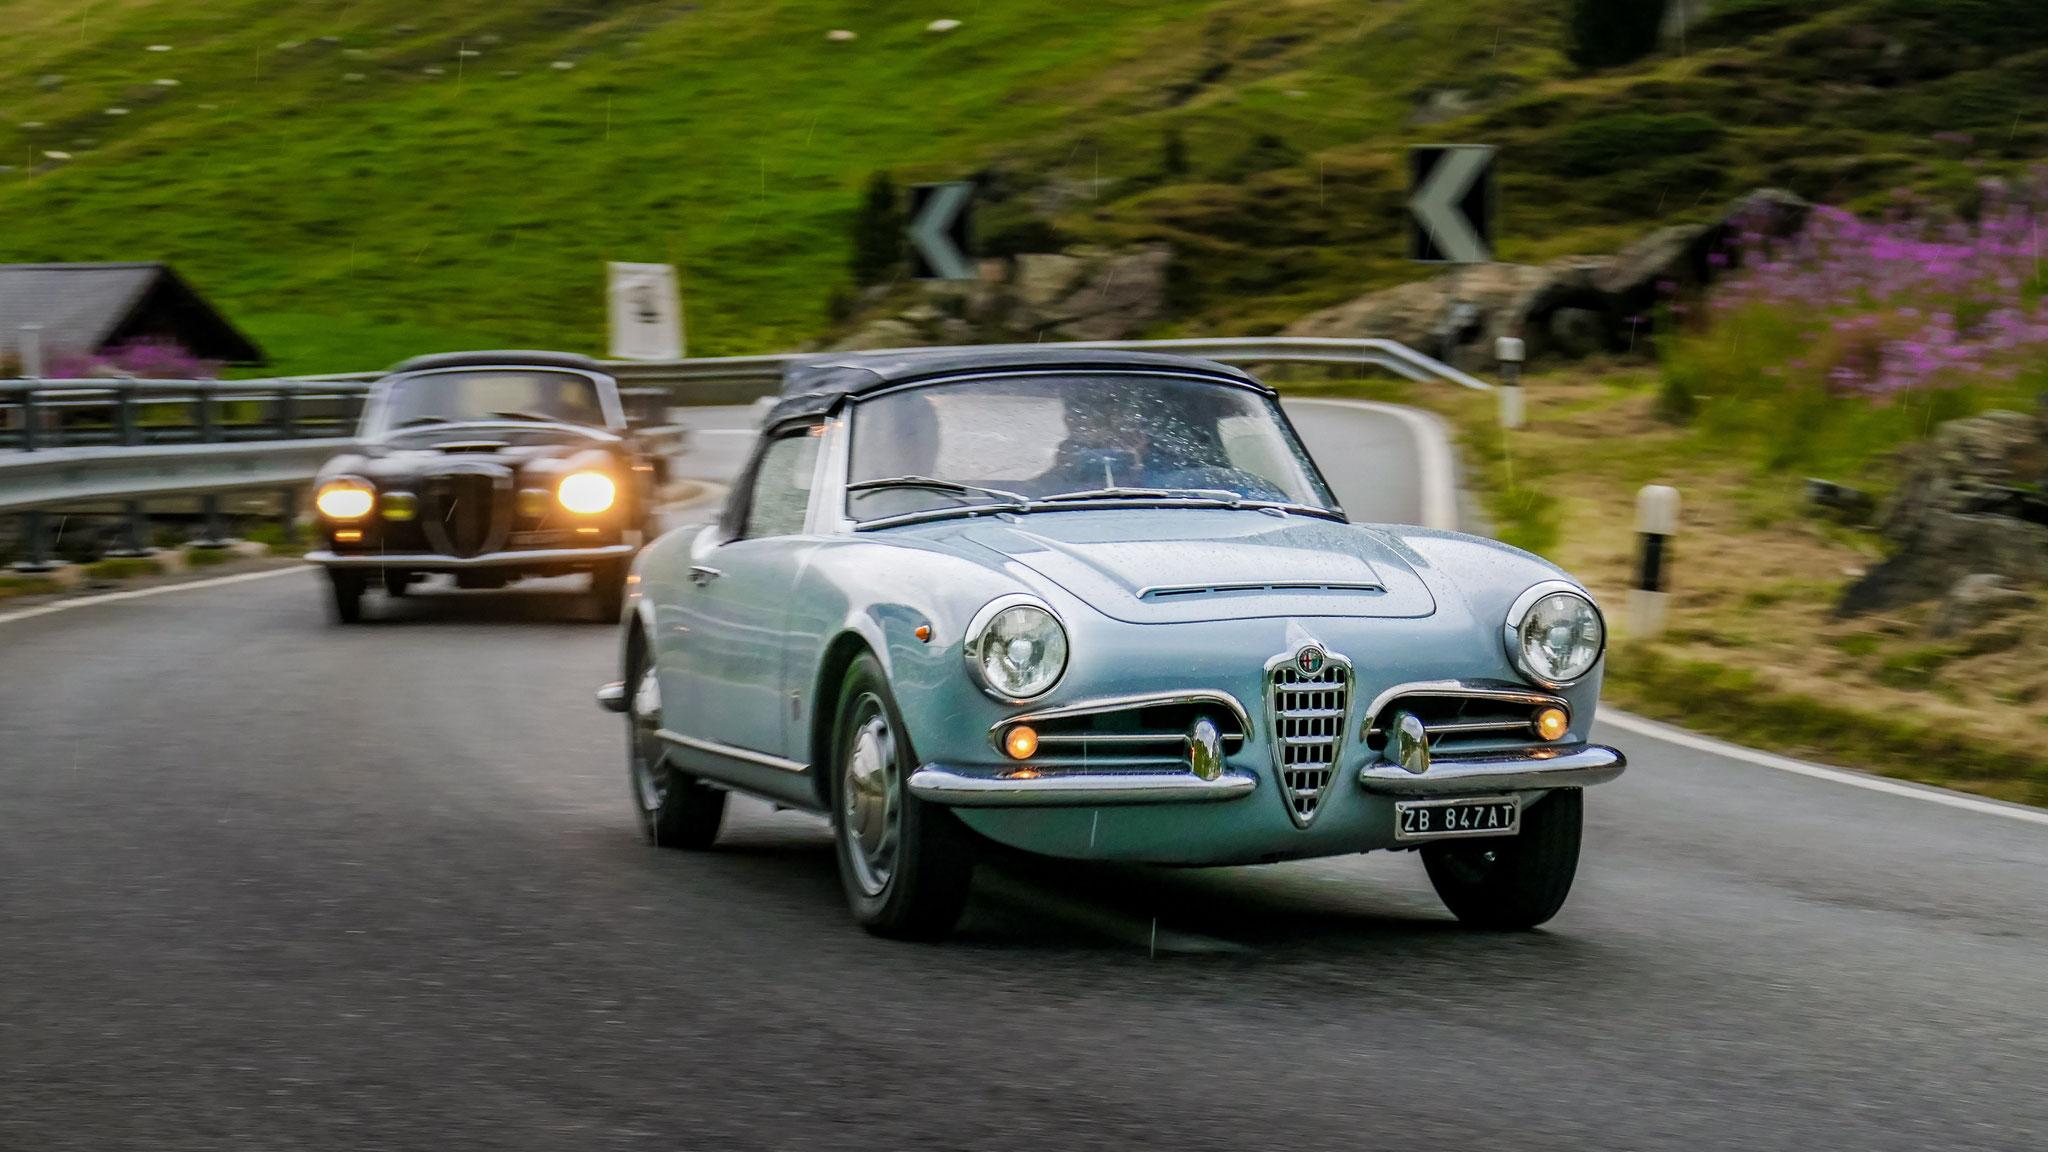 Alfa Romeo Giulia Spider - ZB-847-AT (ITA)